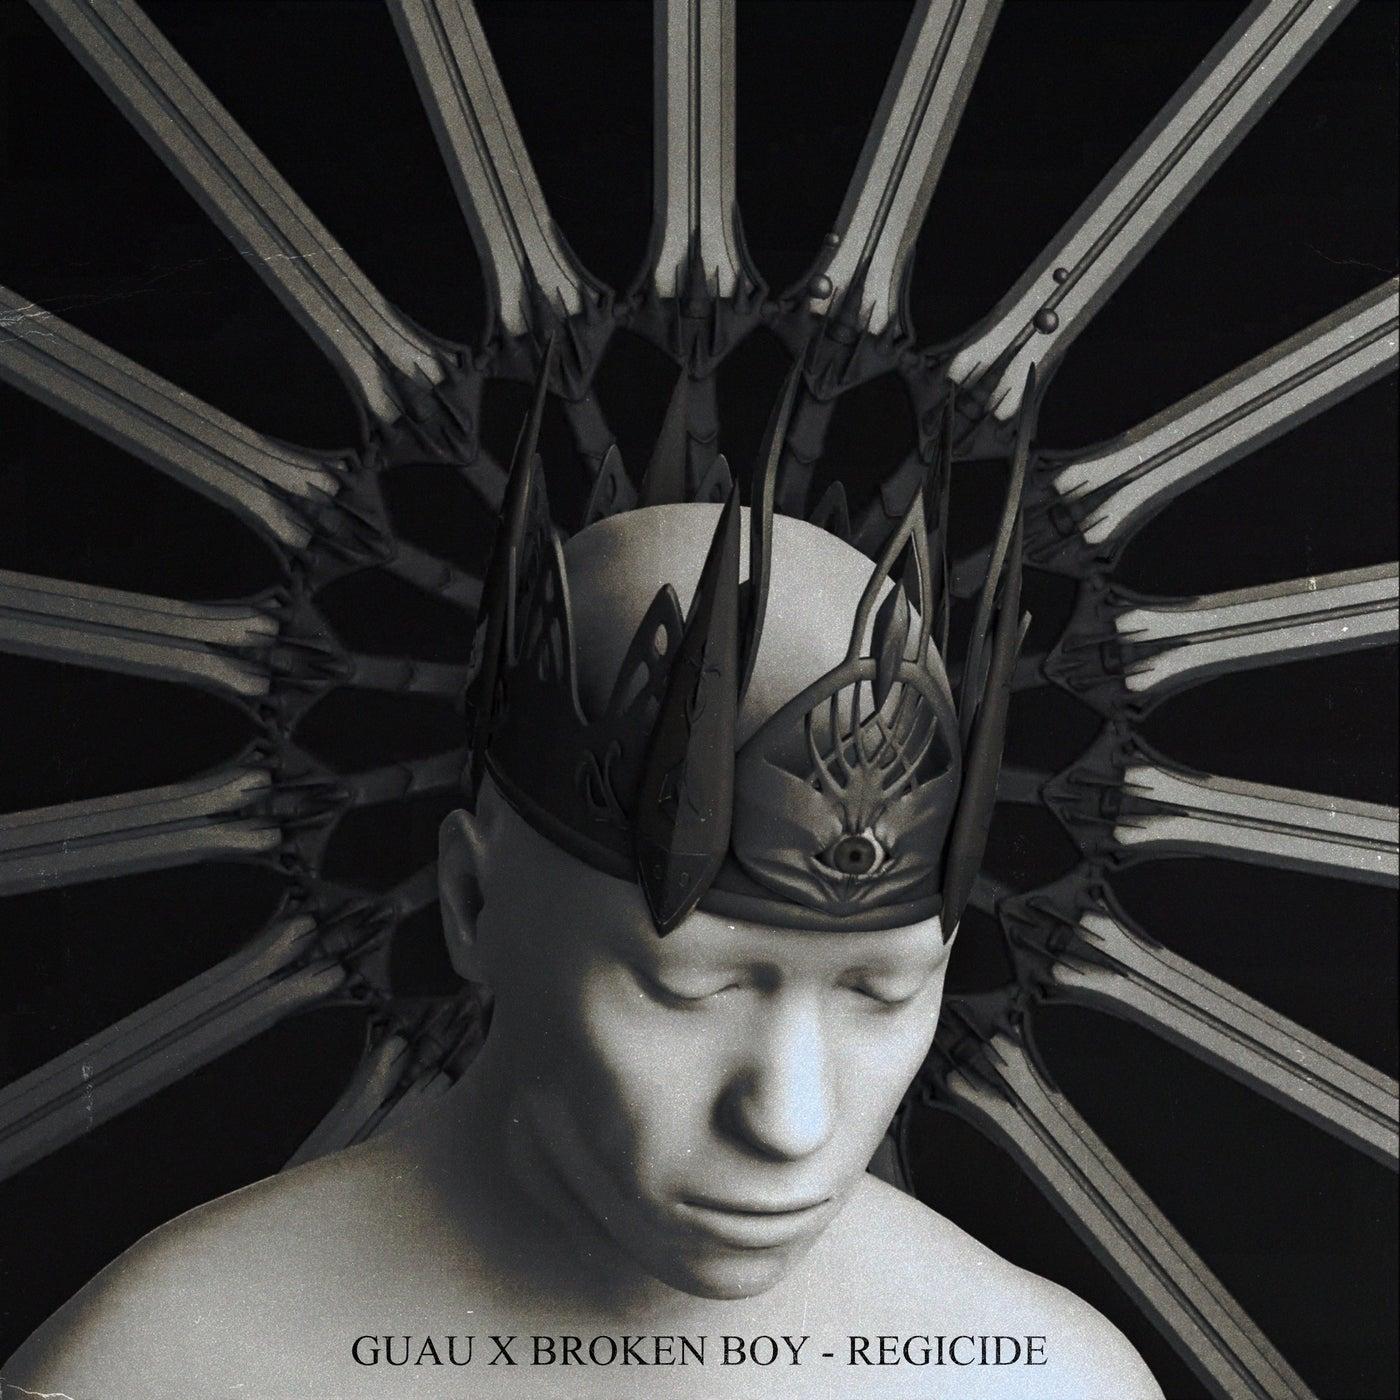 Regicide (Original Mix)